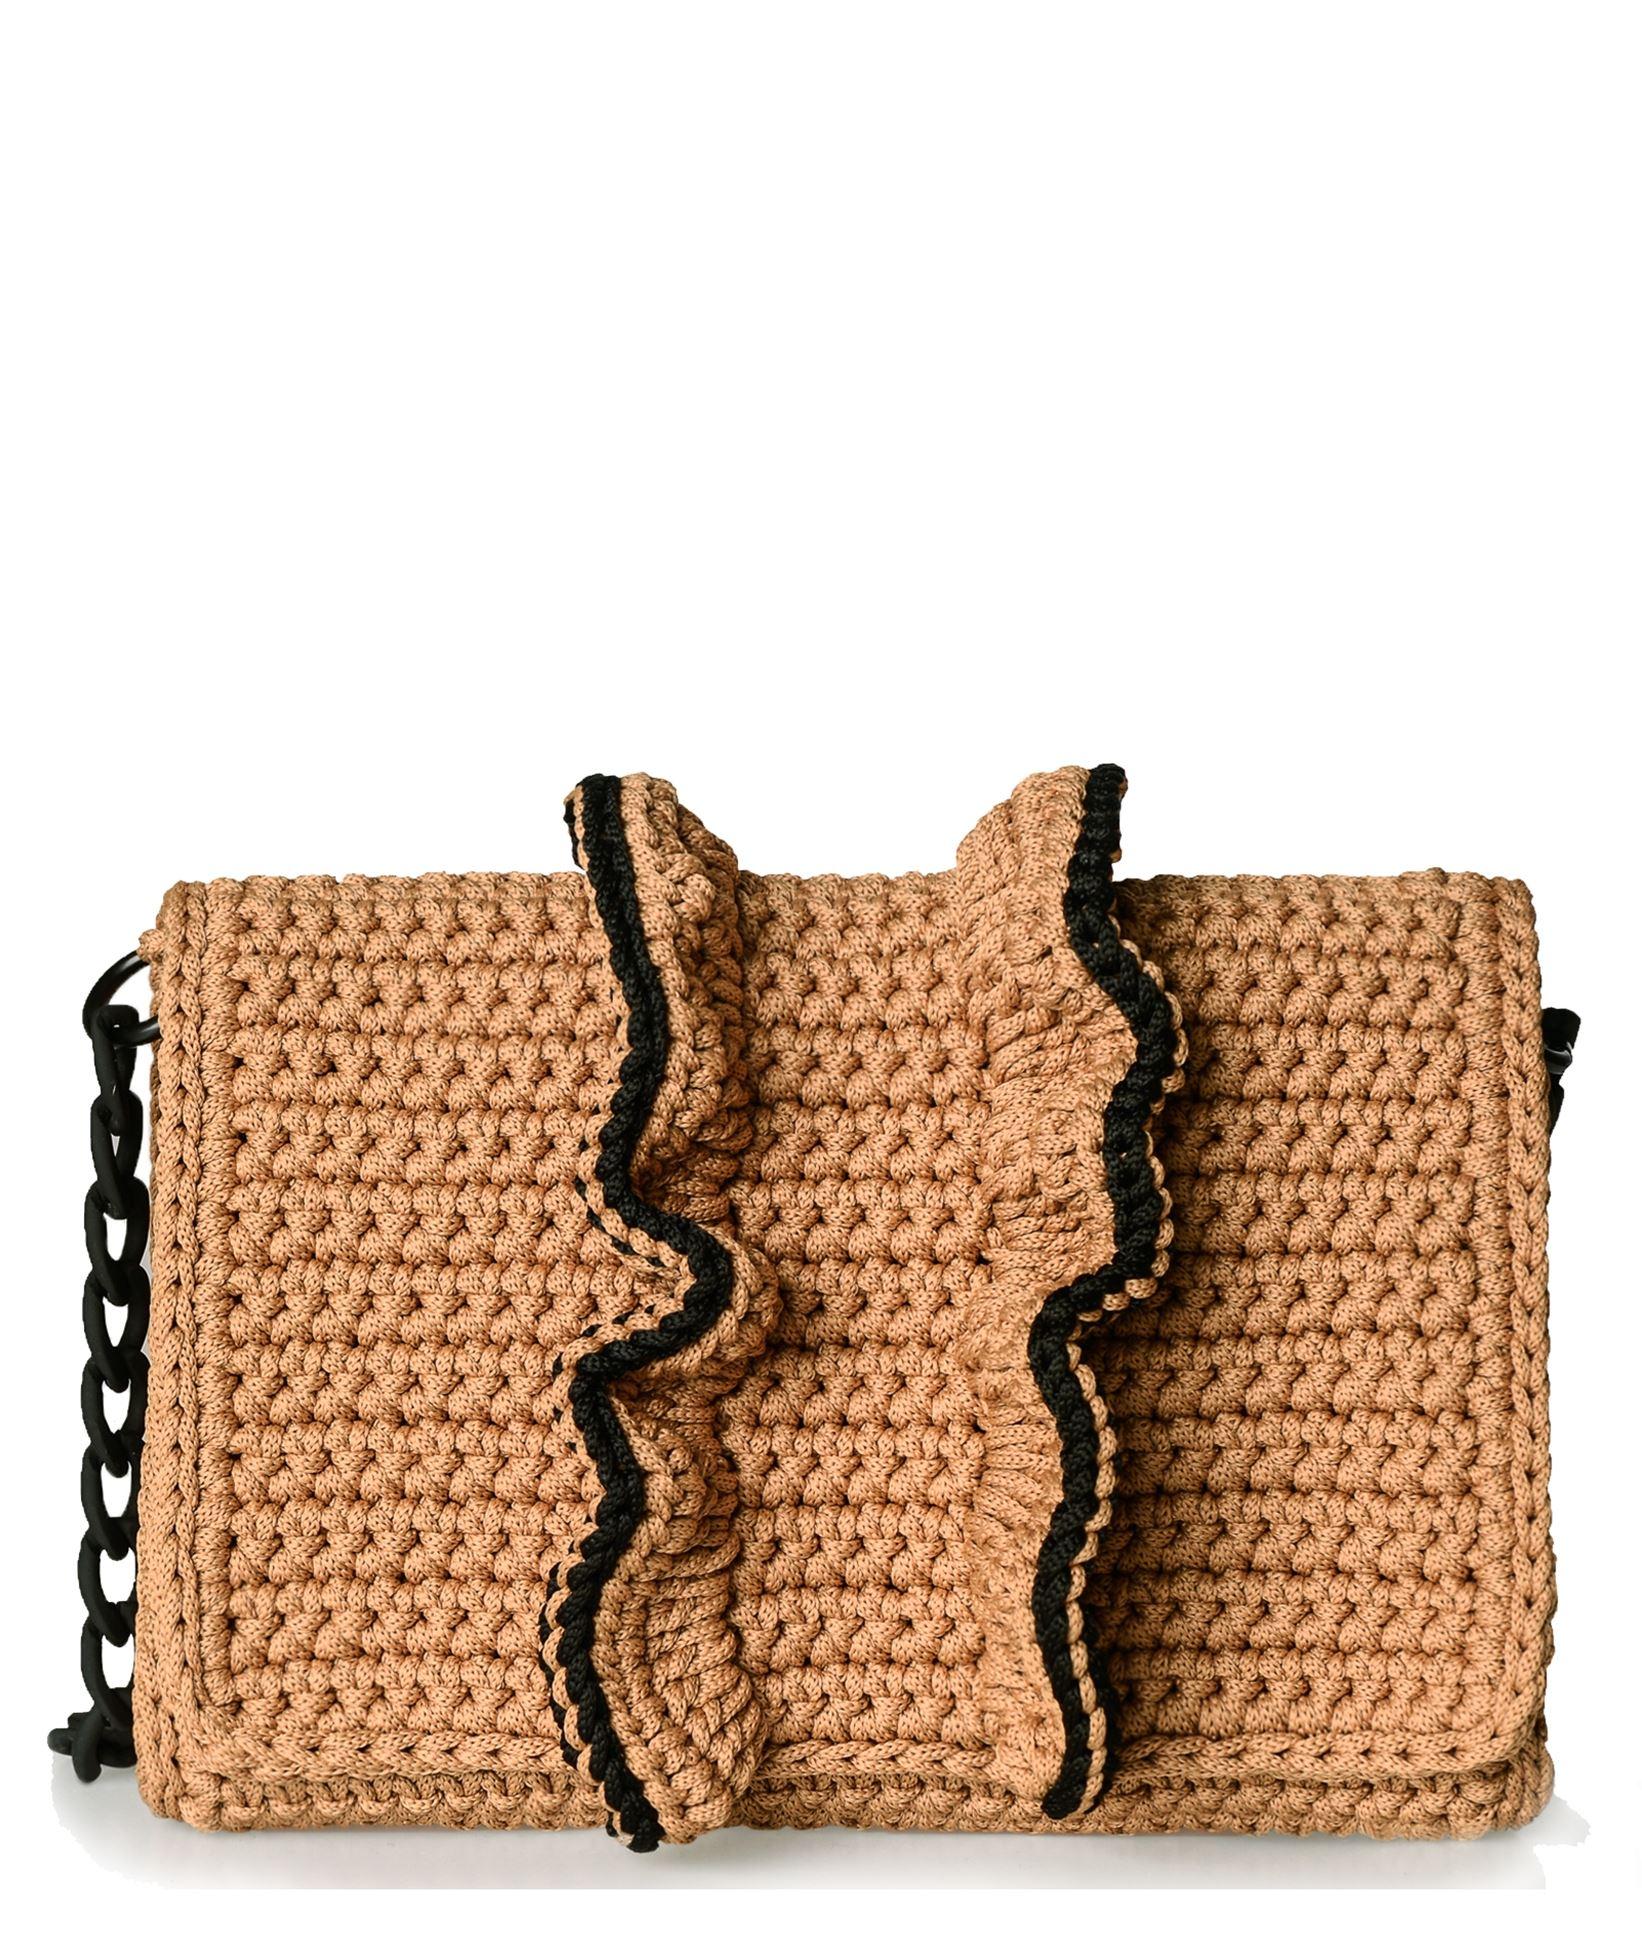 One Only Caramel Black Passion Crochet Medium Bag Summer Bags